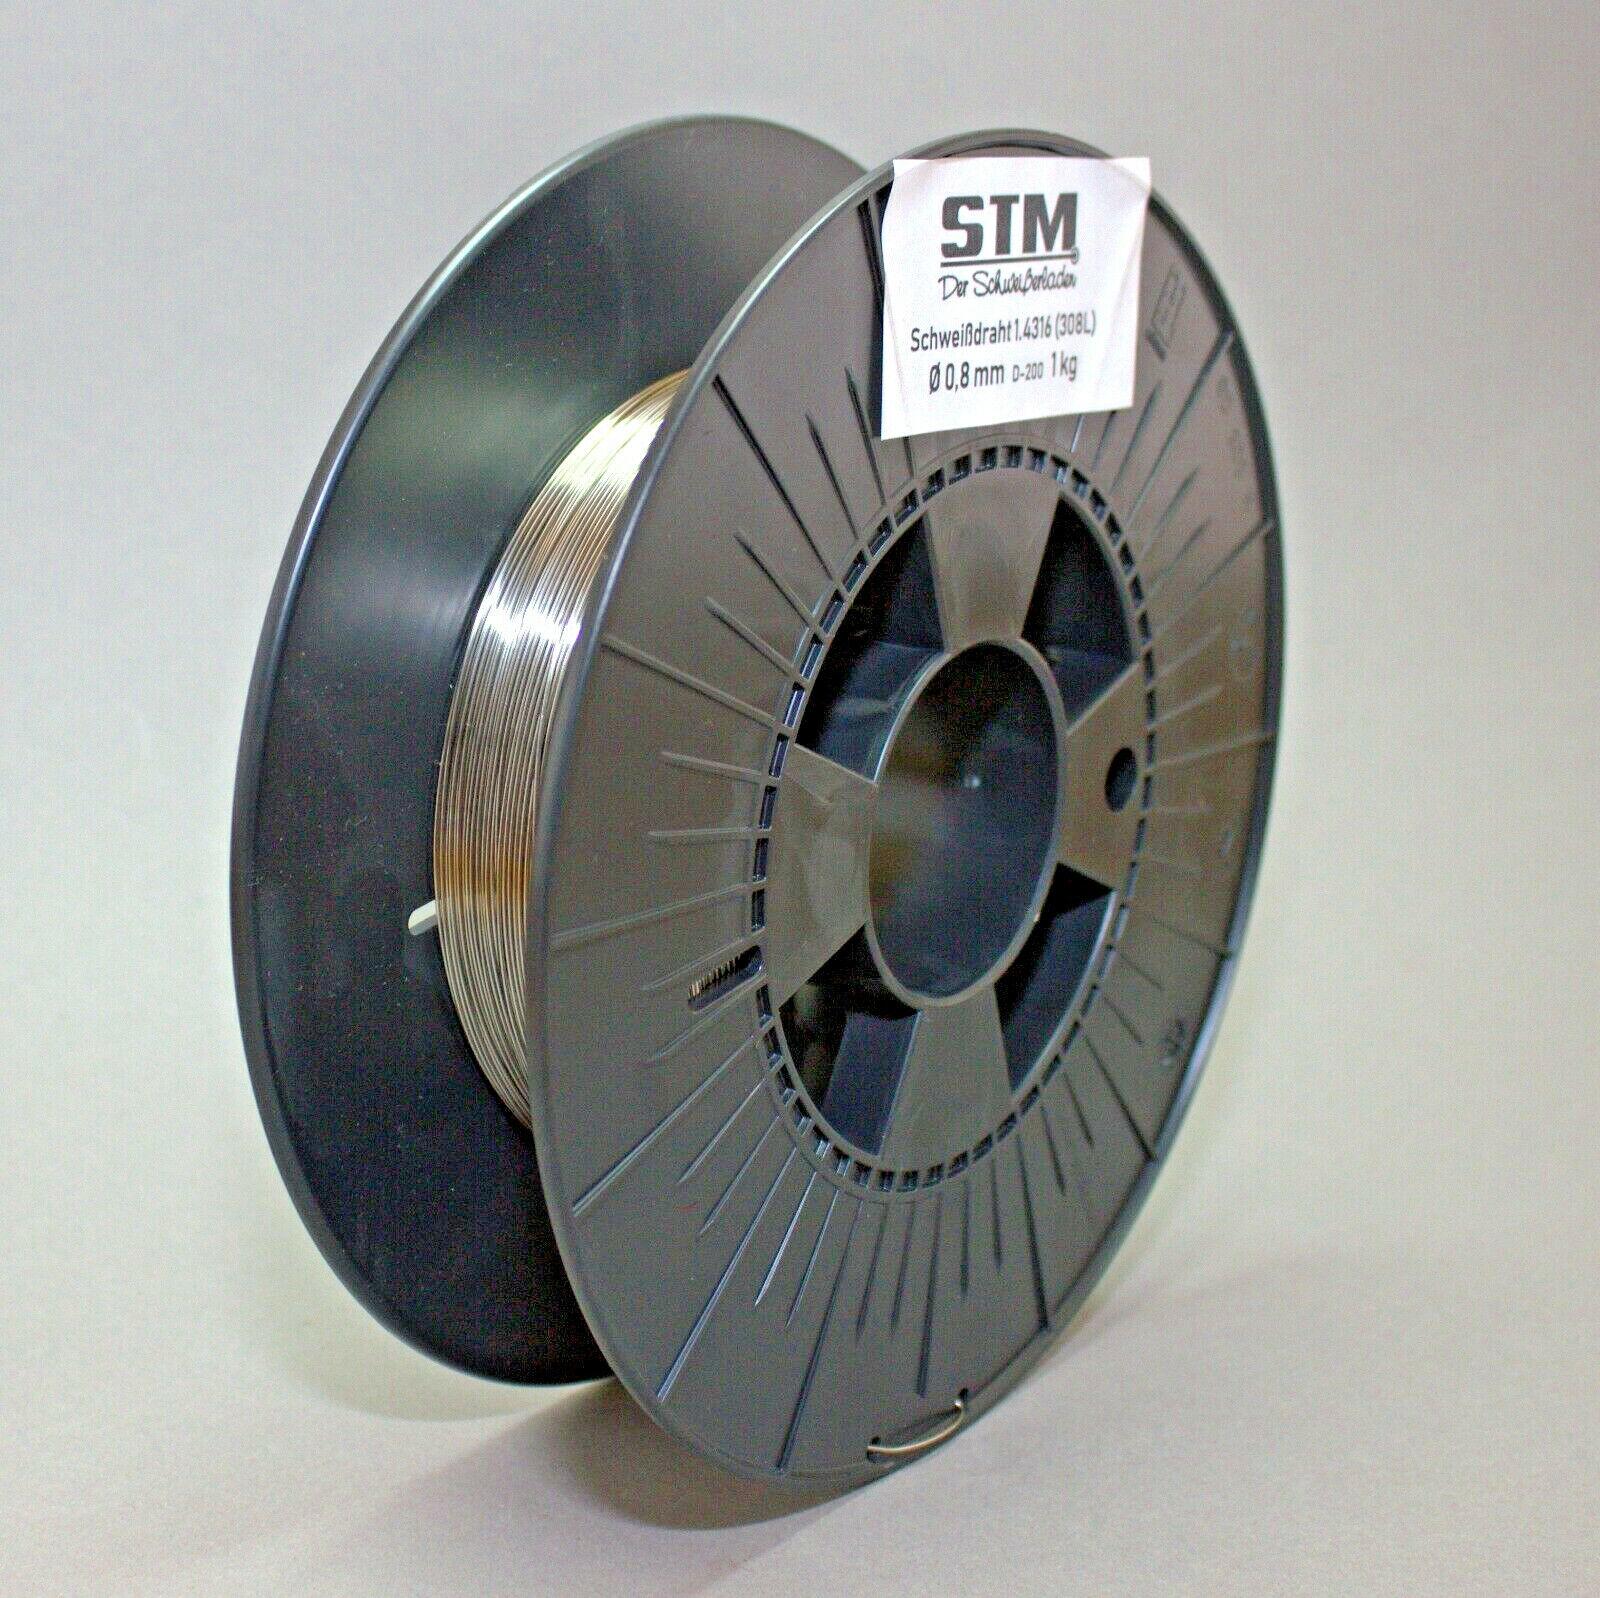 50Stück 2,54mm Stecker JR Crimpkontakte für 22-28AWG Kabel Arduino DIY